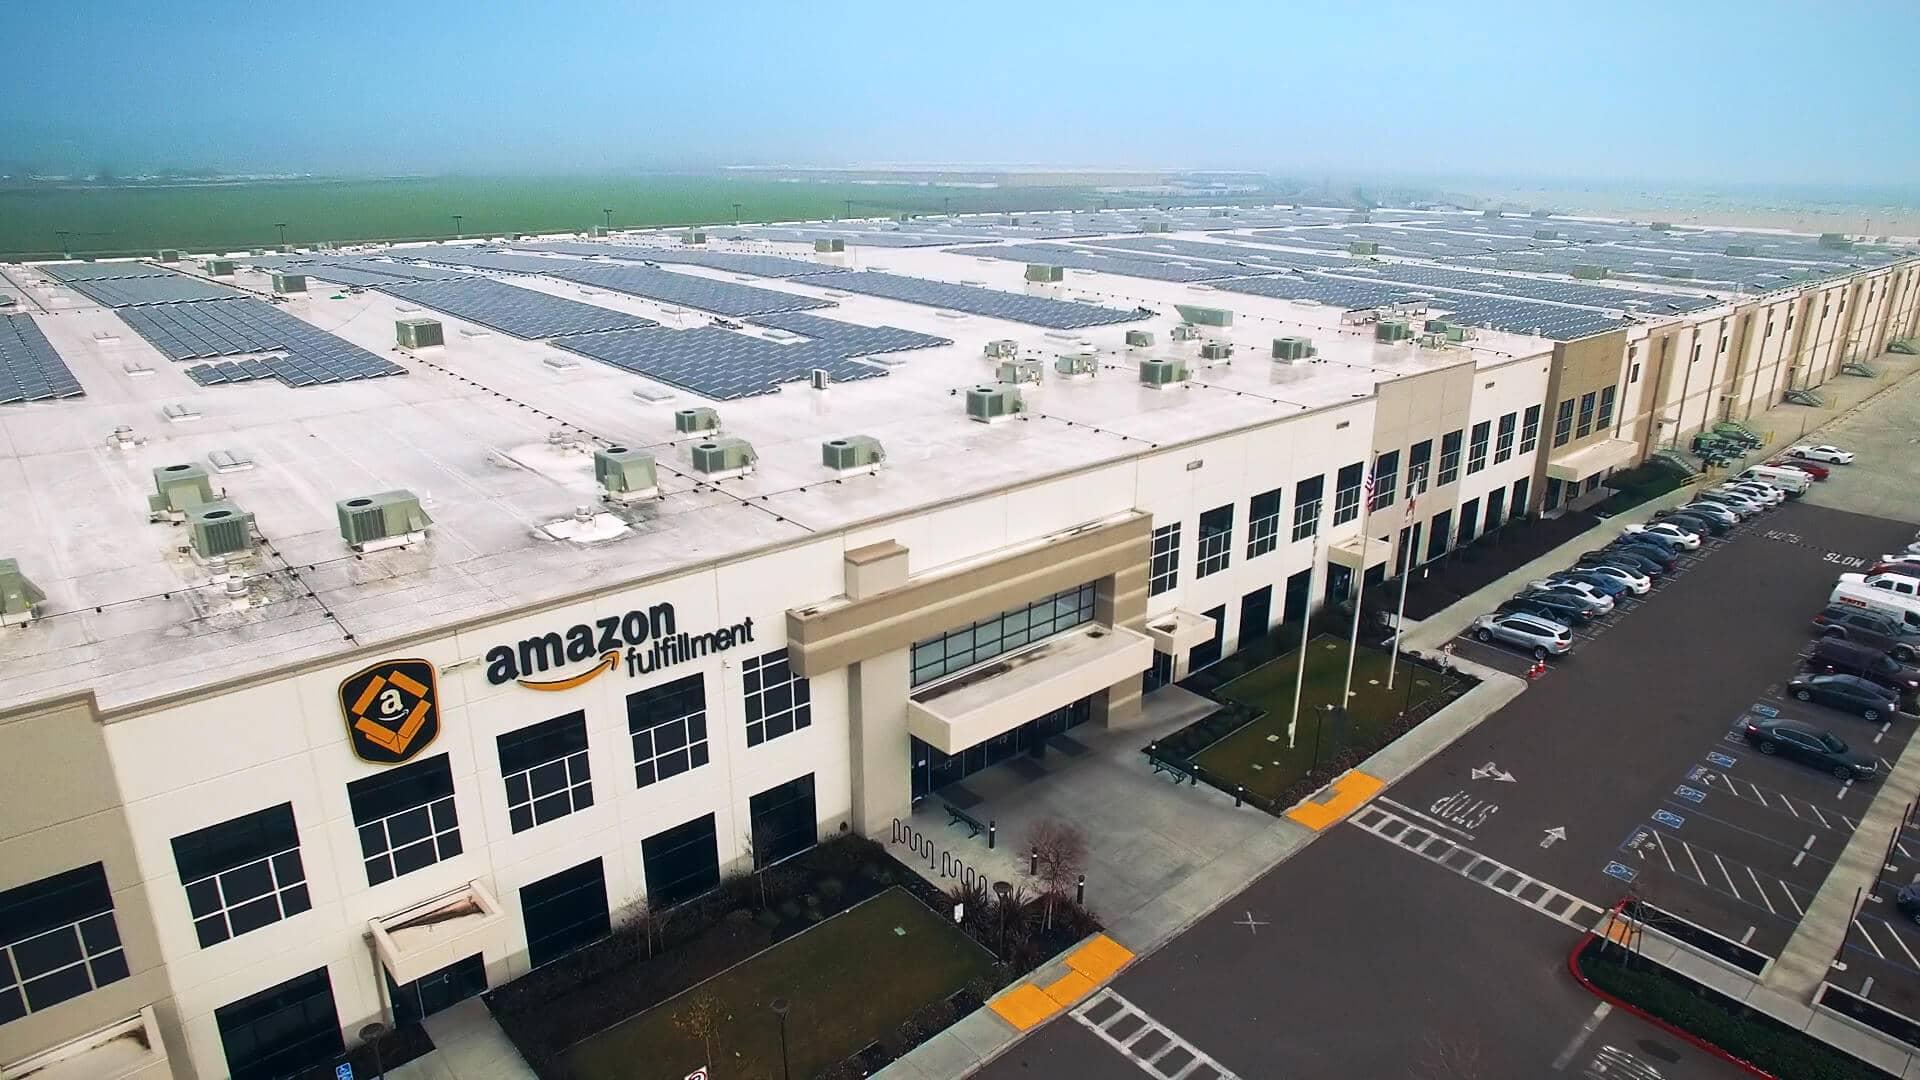 Amazon Amazon Launches Global Rooftop Solar Initiative